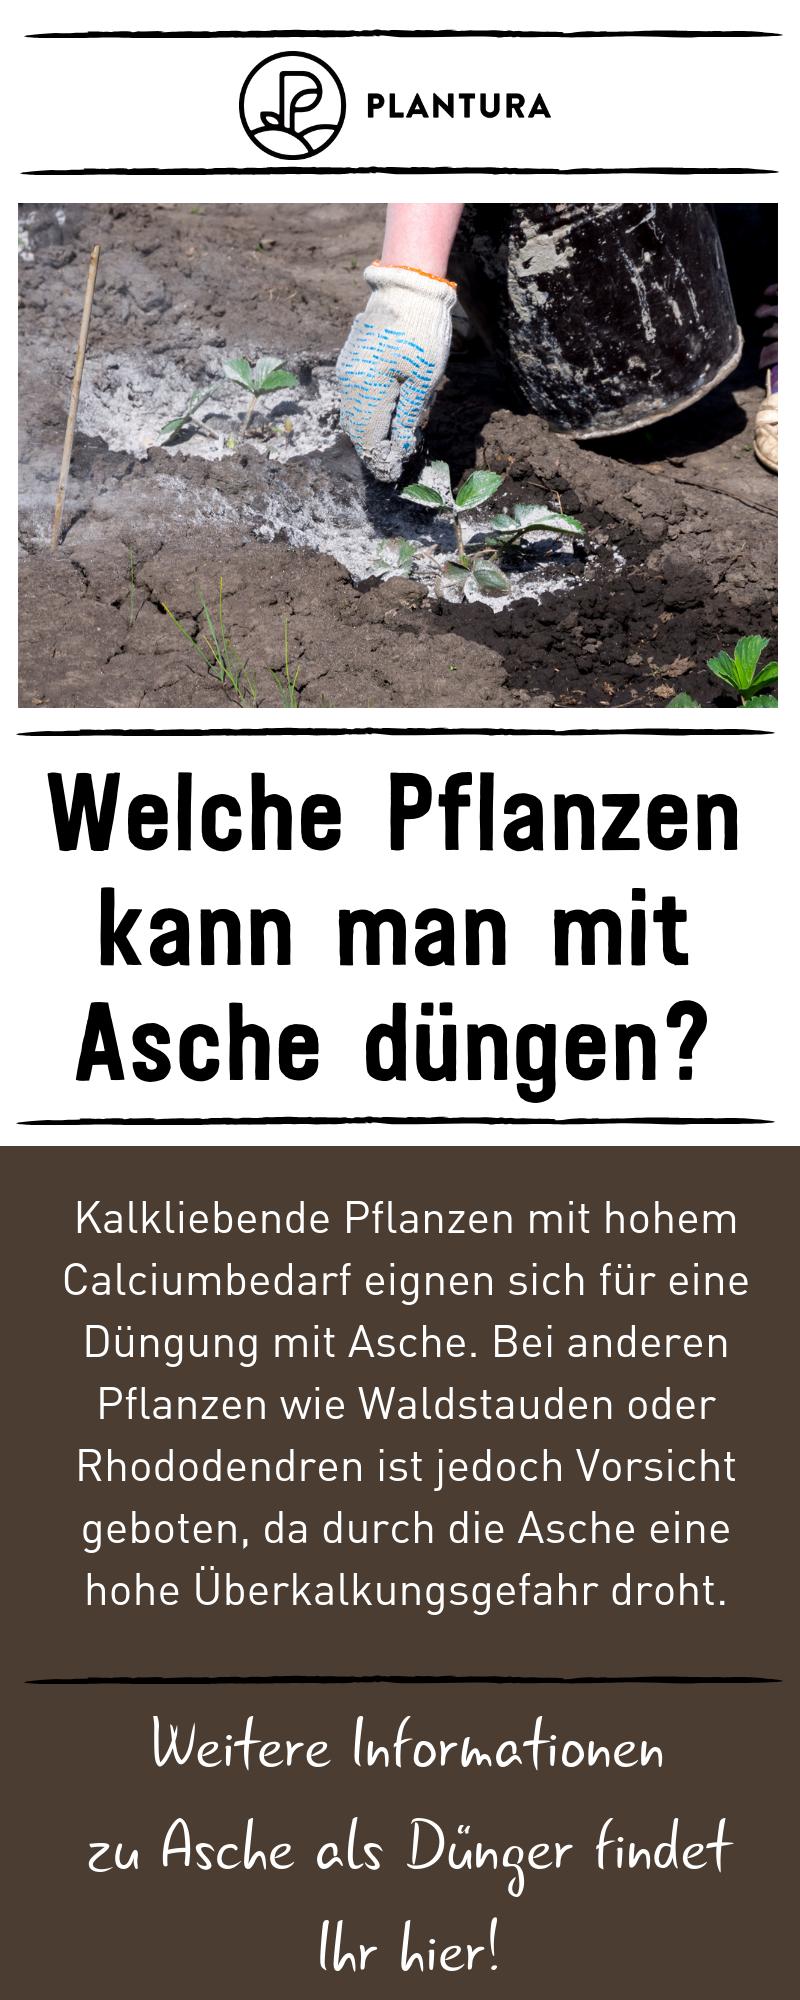 Asche Als Dunger Anwendung Von Holzasche Im Garten Pflanzen Asche Als Dunger Garten Neu Anlegen